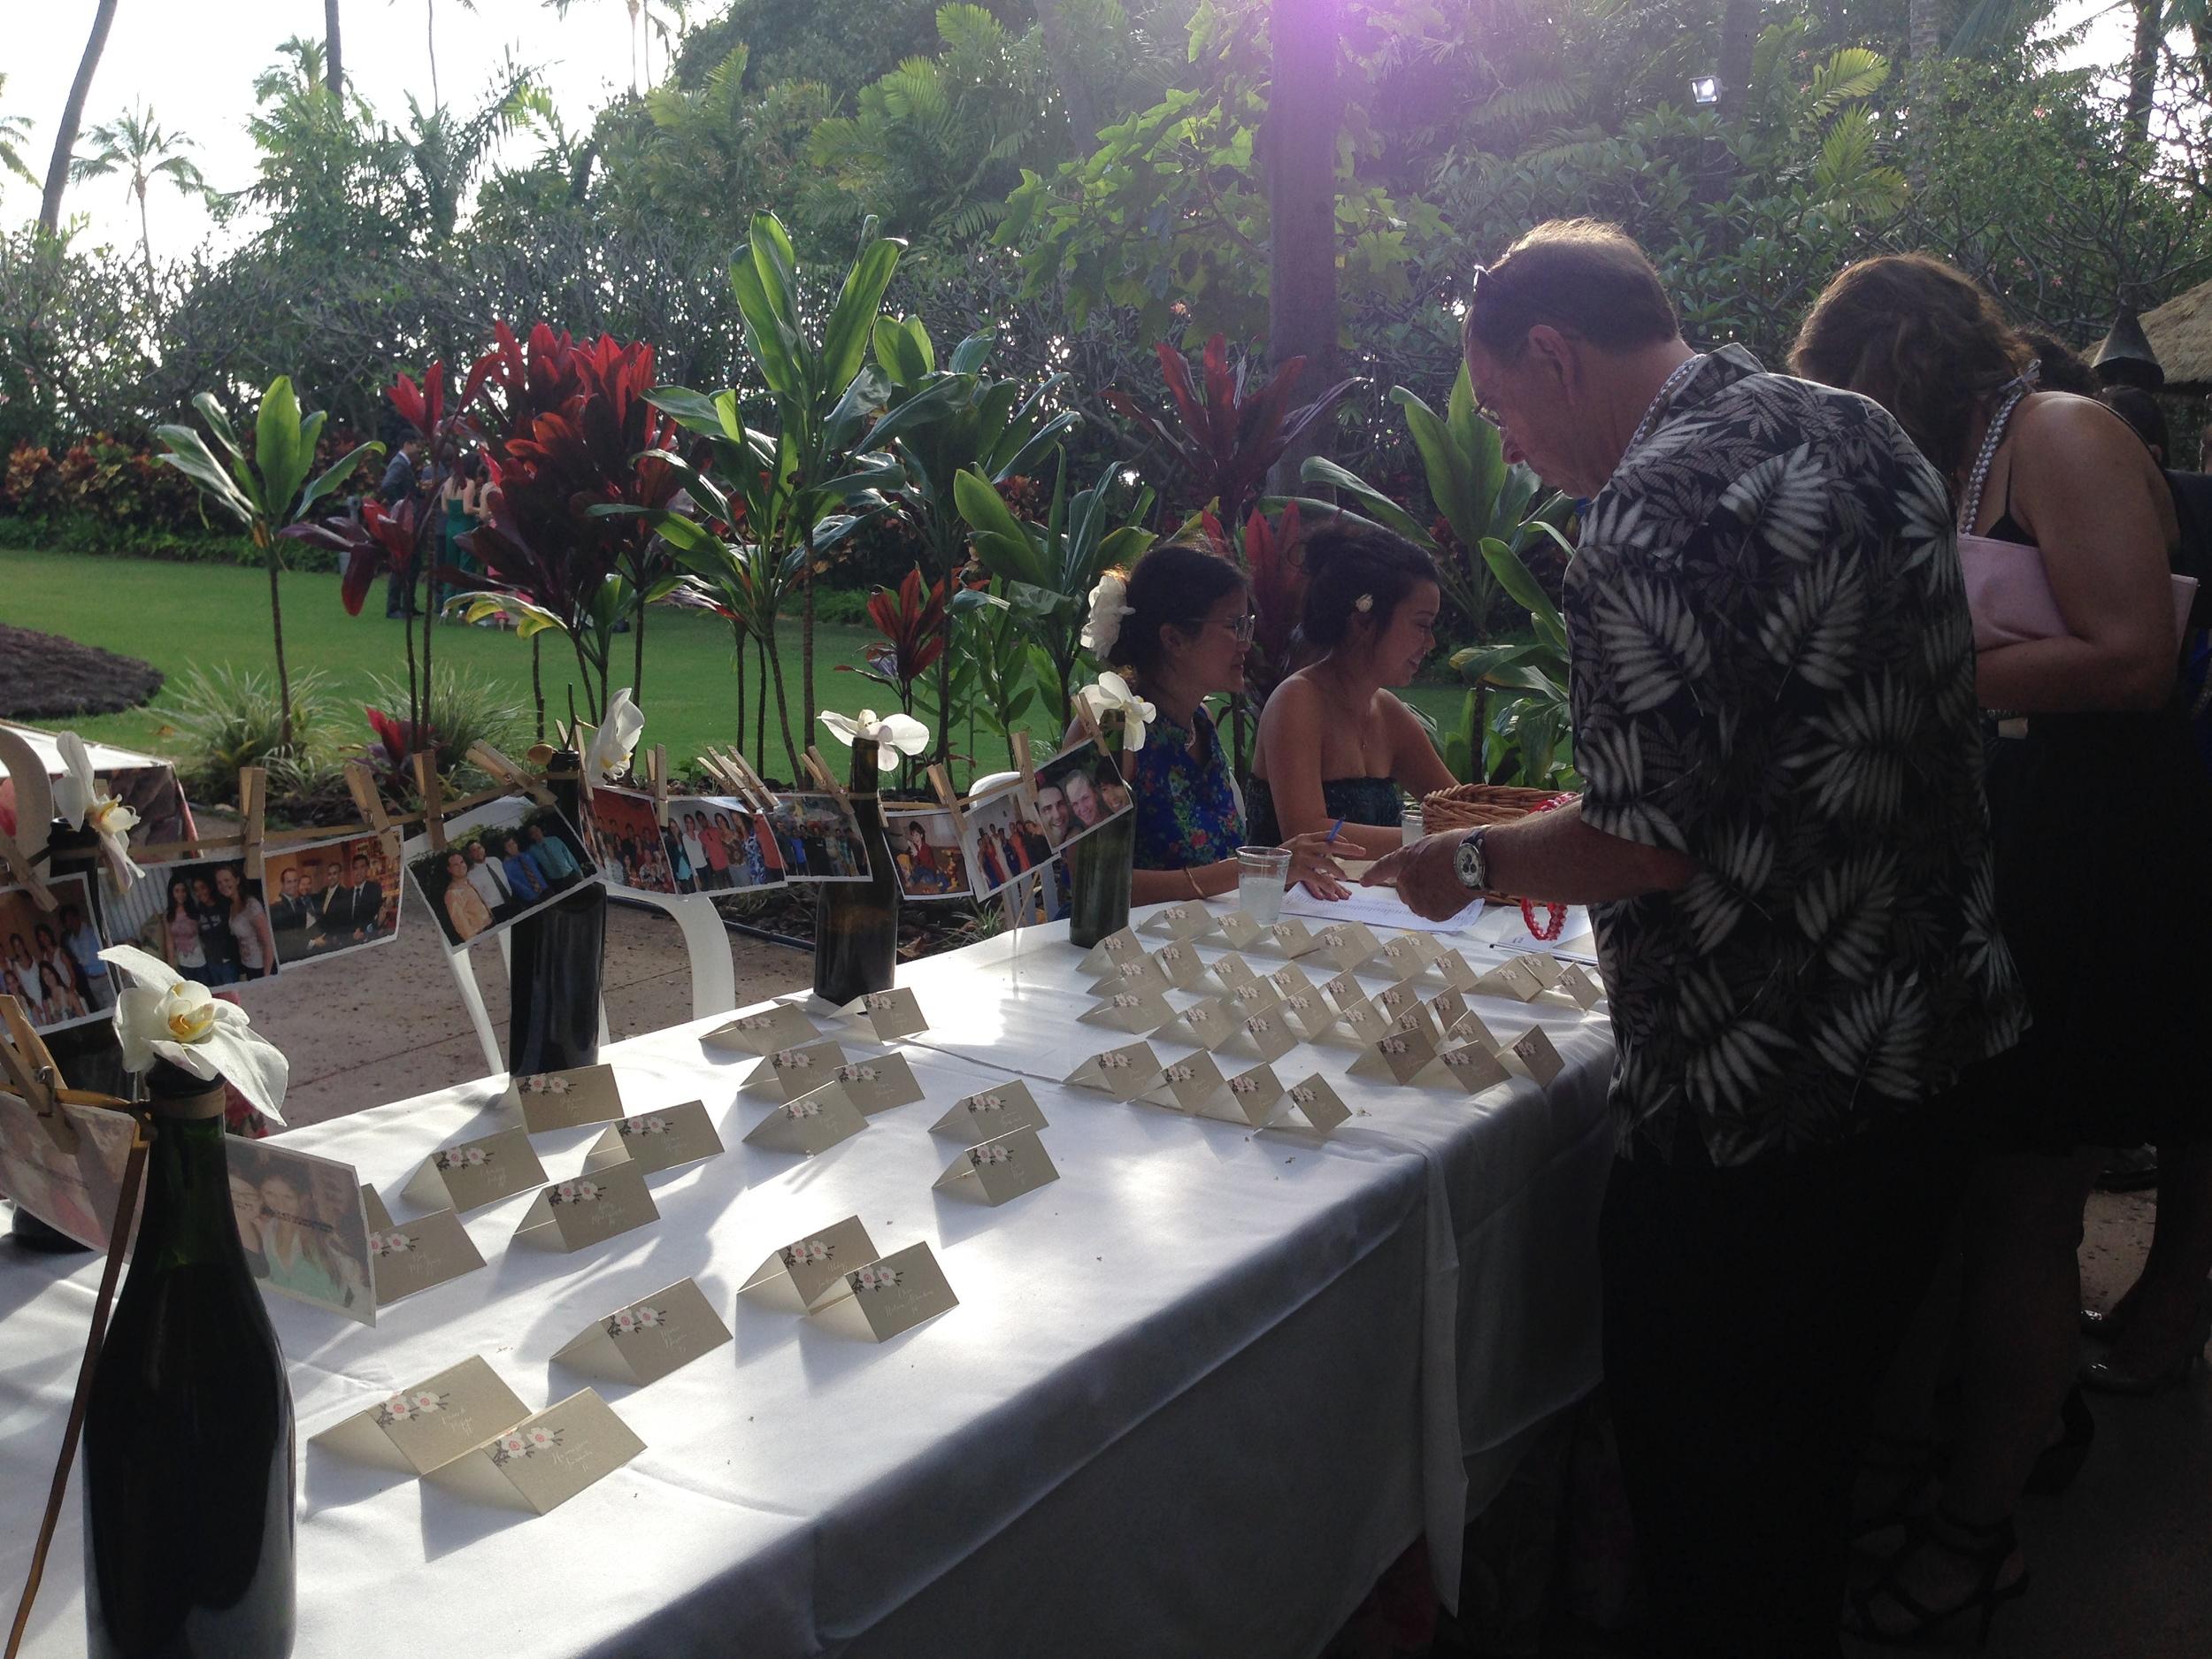 AARON  DARIEN Hale Koa Hotel Luau Garden Wedding April 4 2015  Best Day Ever